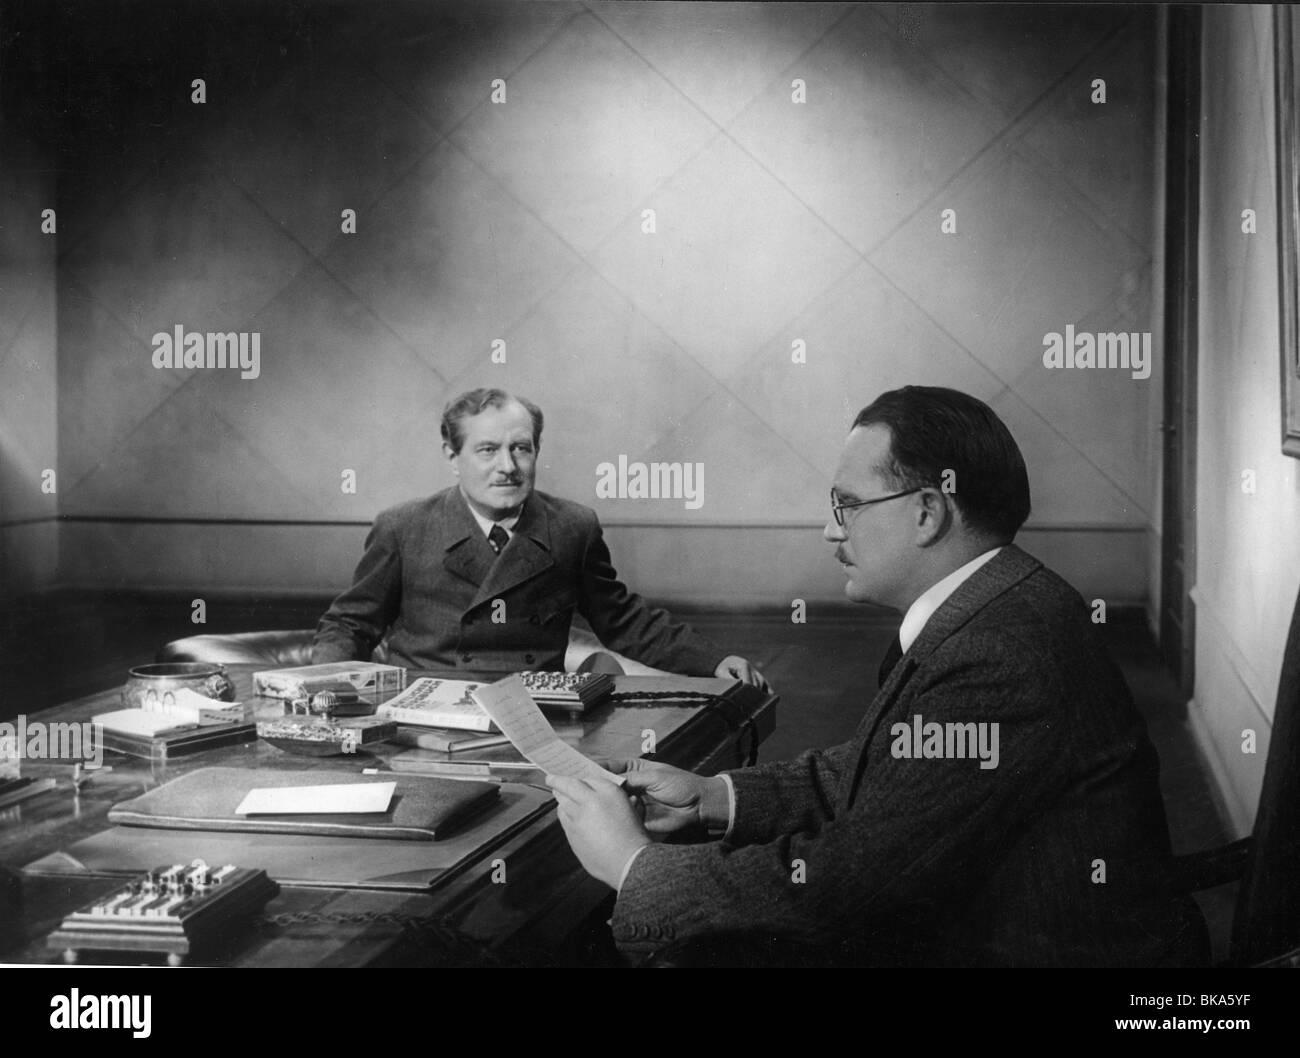 Emil und die Detektive Anno: 1931 Regia: Gerhard Lamprecht ; basato su Erich Kästner del romanzo Immagini Stock